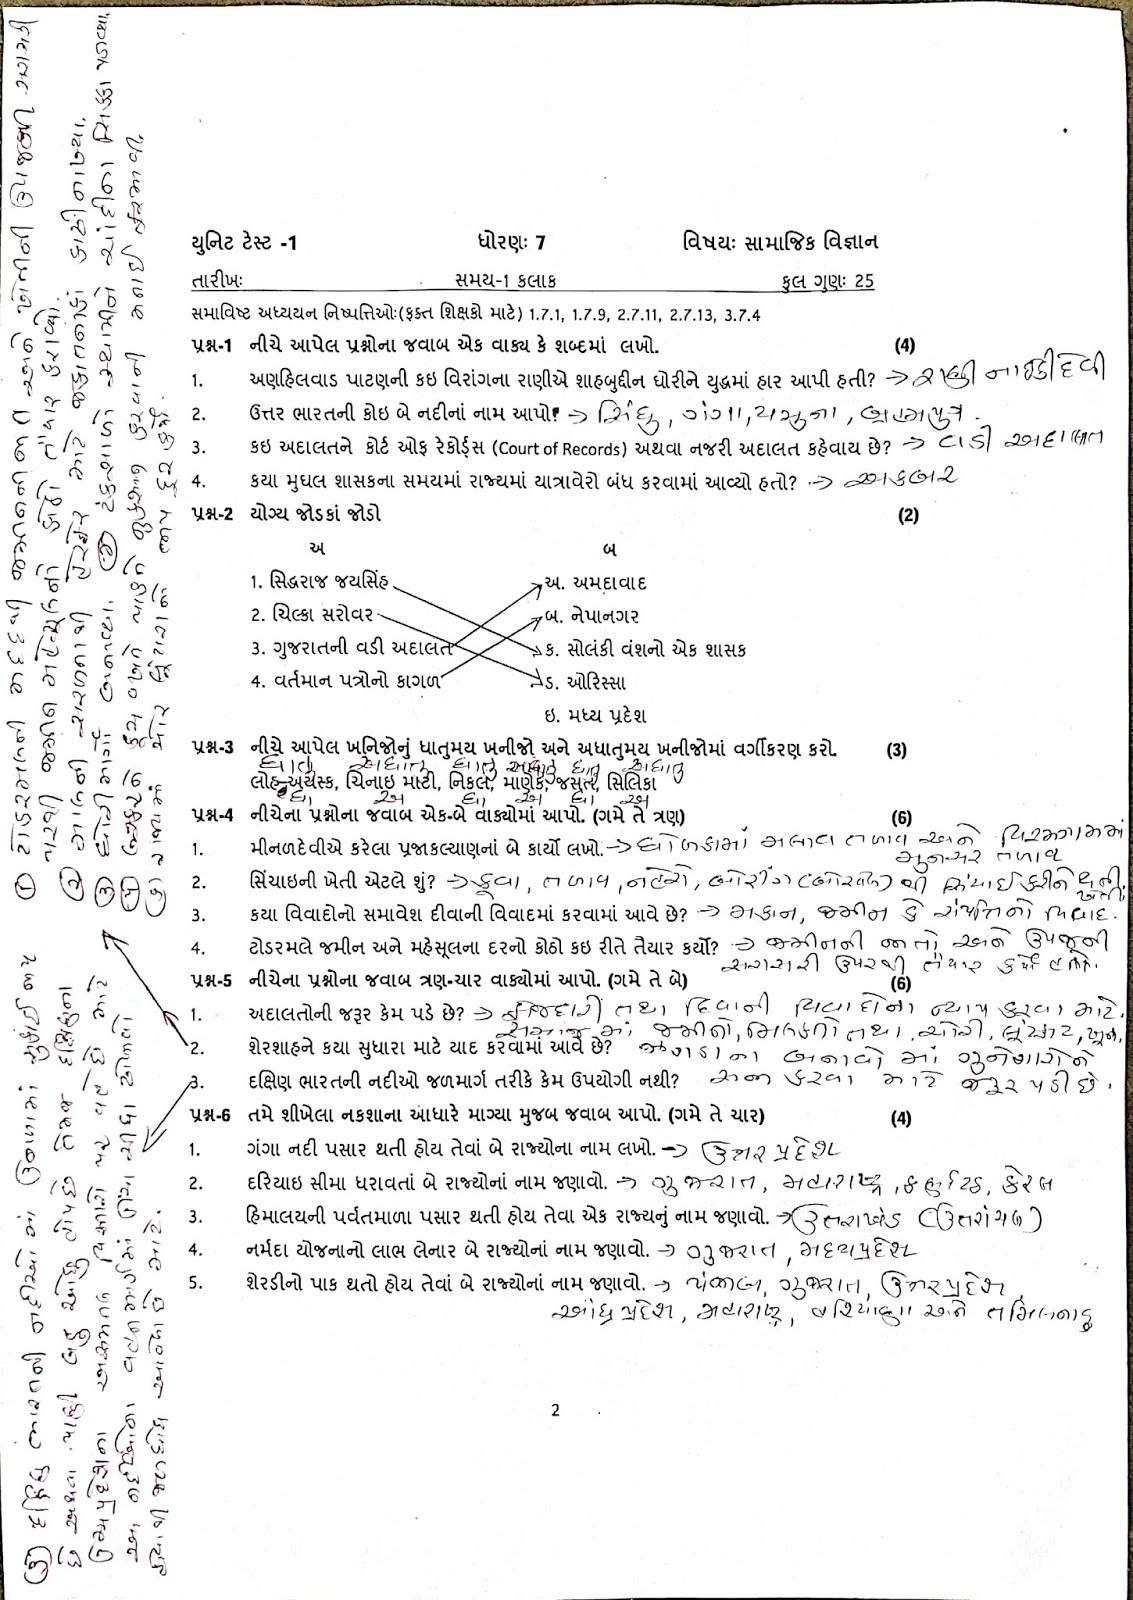 NILESH JADAV: STD- 6 TO 8 SOCIAL SCIENCE SUBJECT UNIT TEST